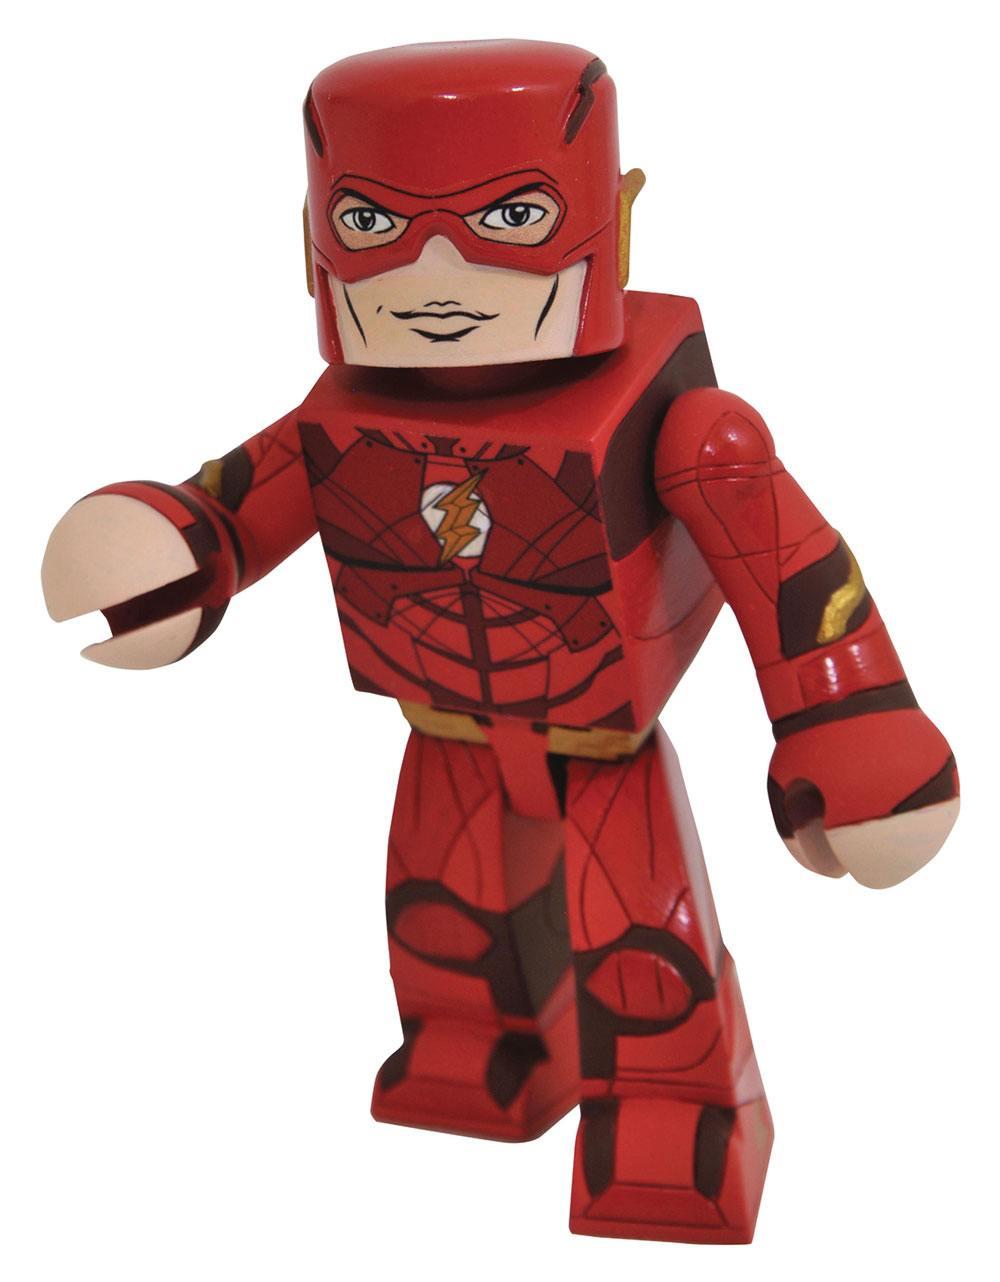 Justice League Movie Vinimates Figure The Flash 10 cm